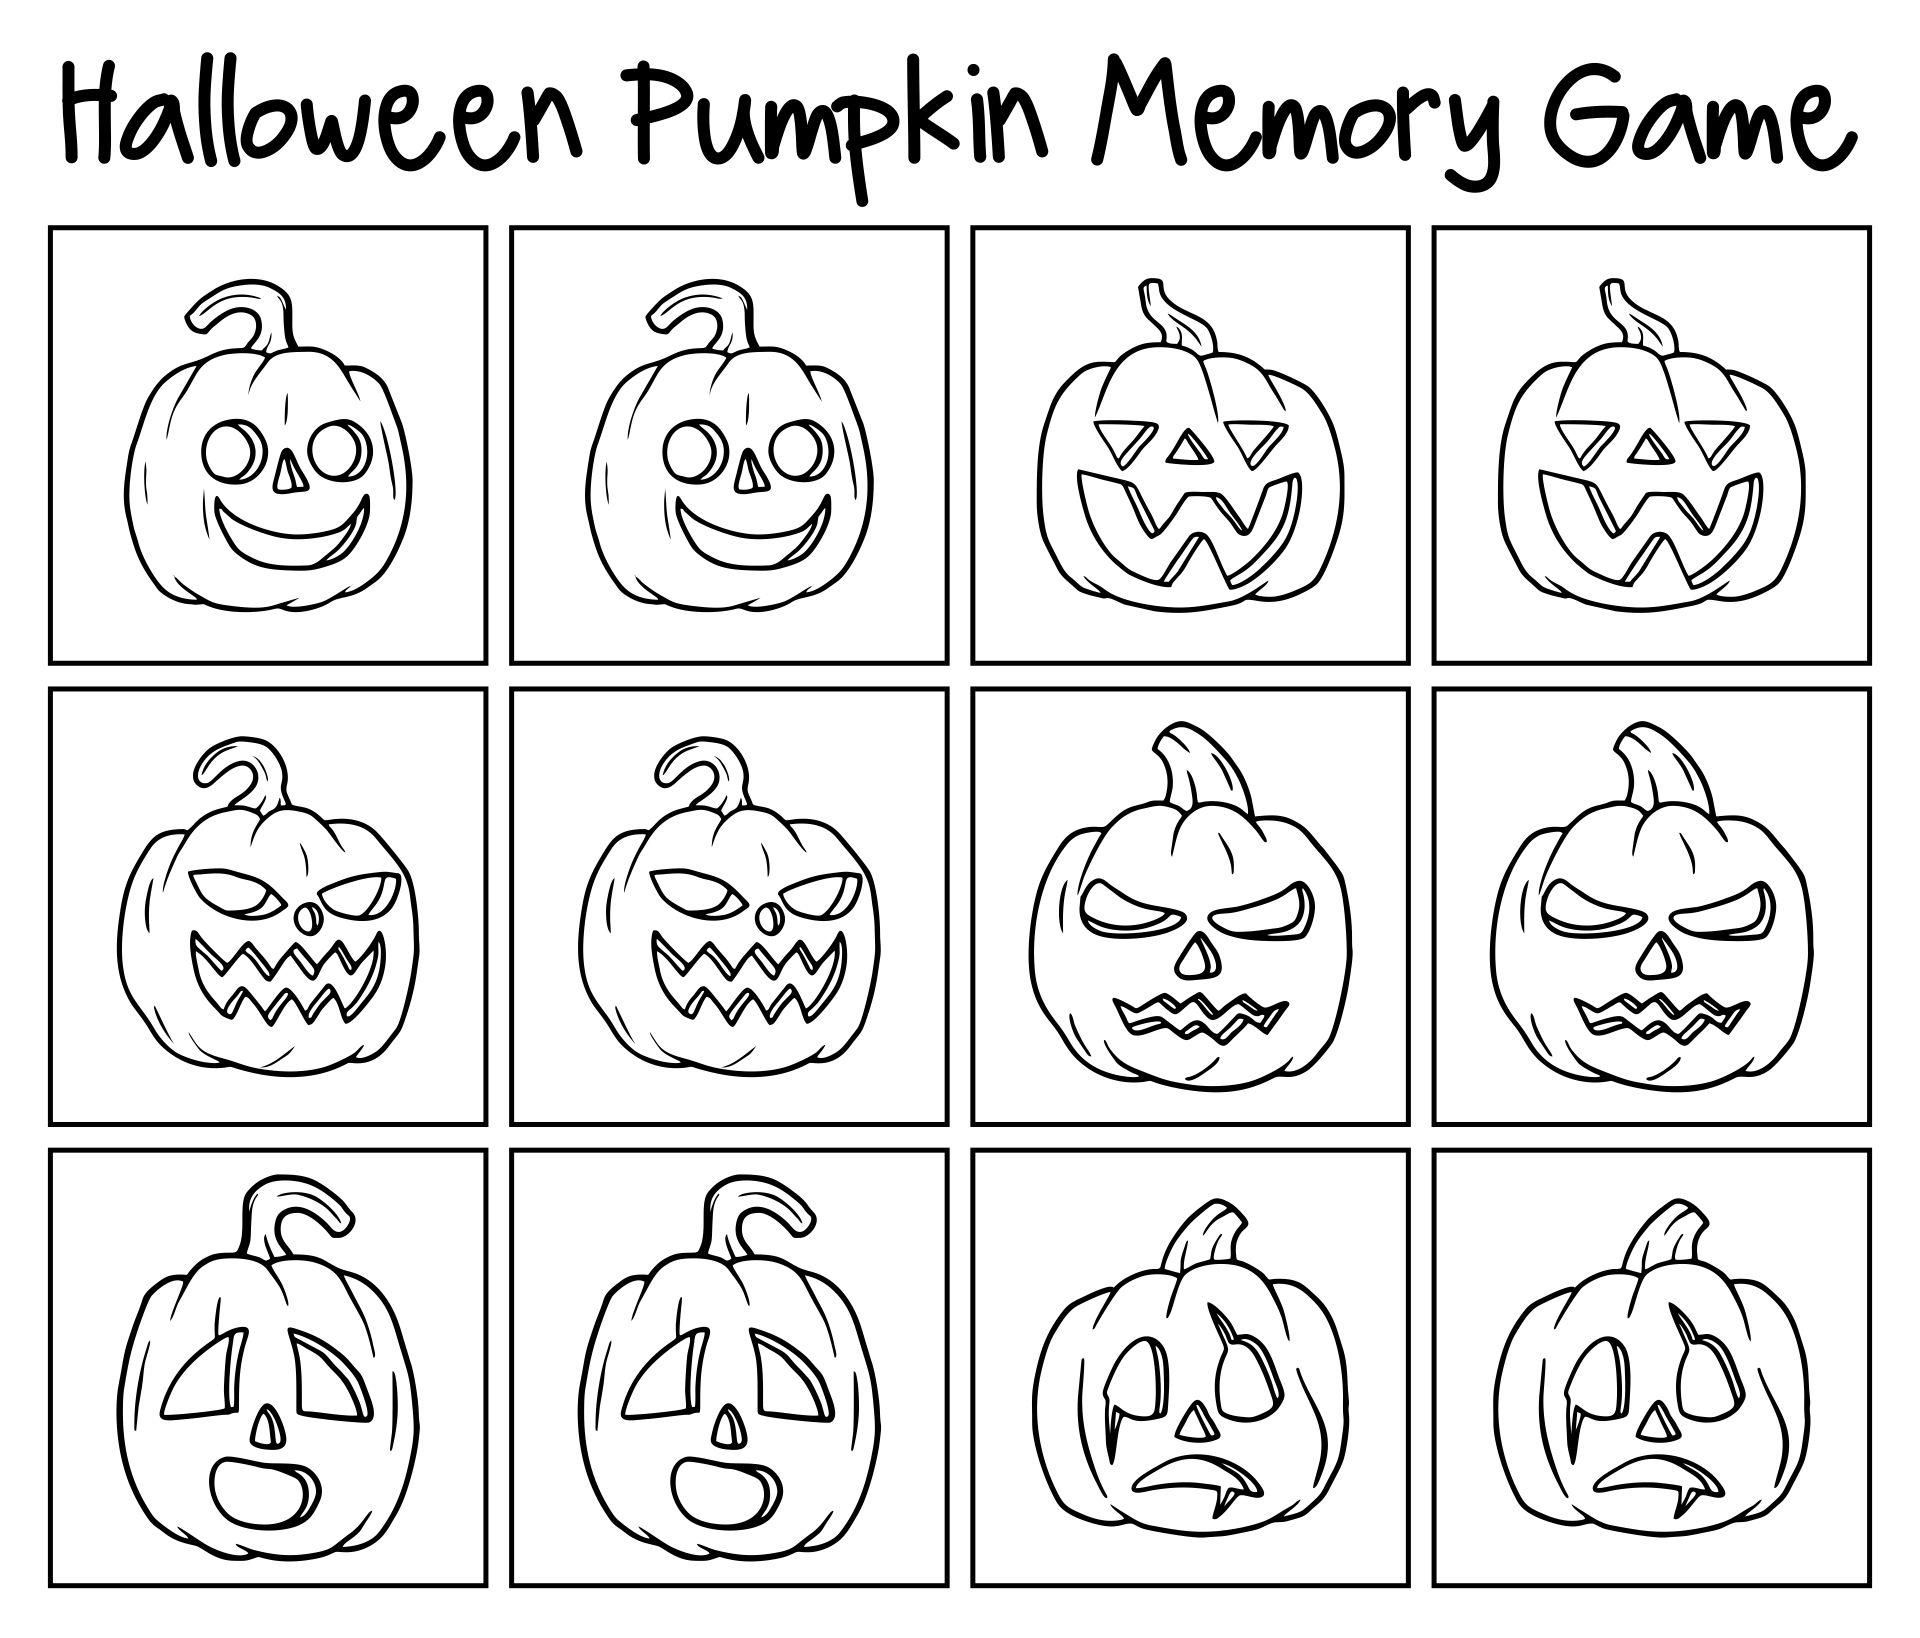 Halloween Pumpkin Memory Game For Kids